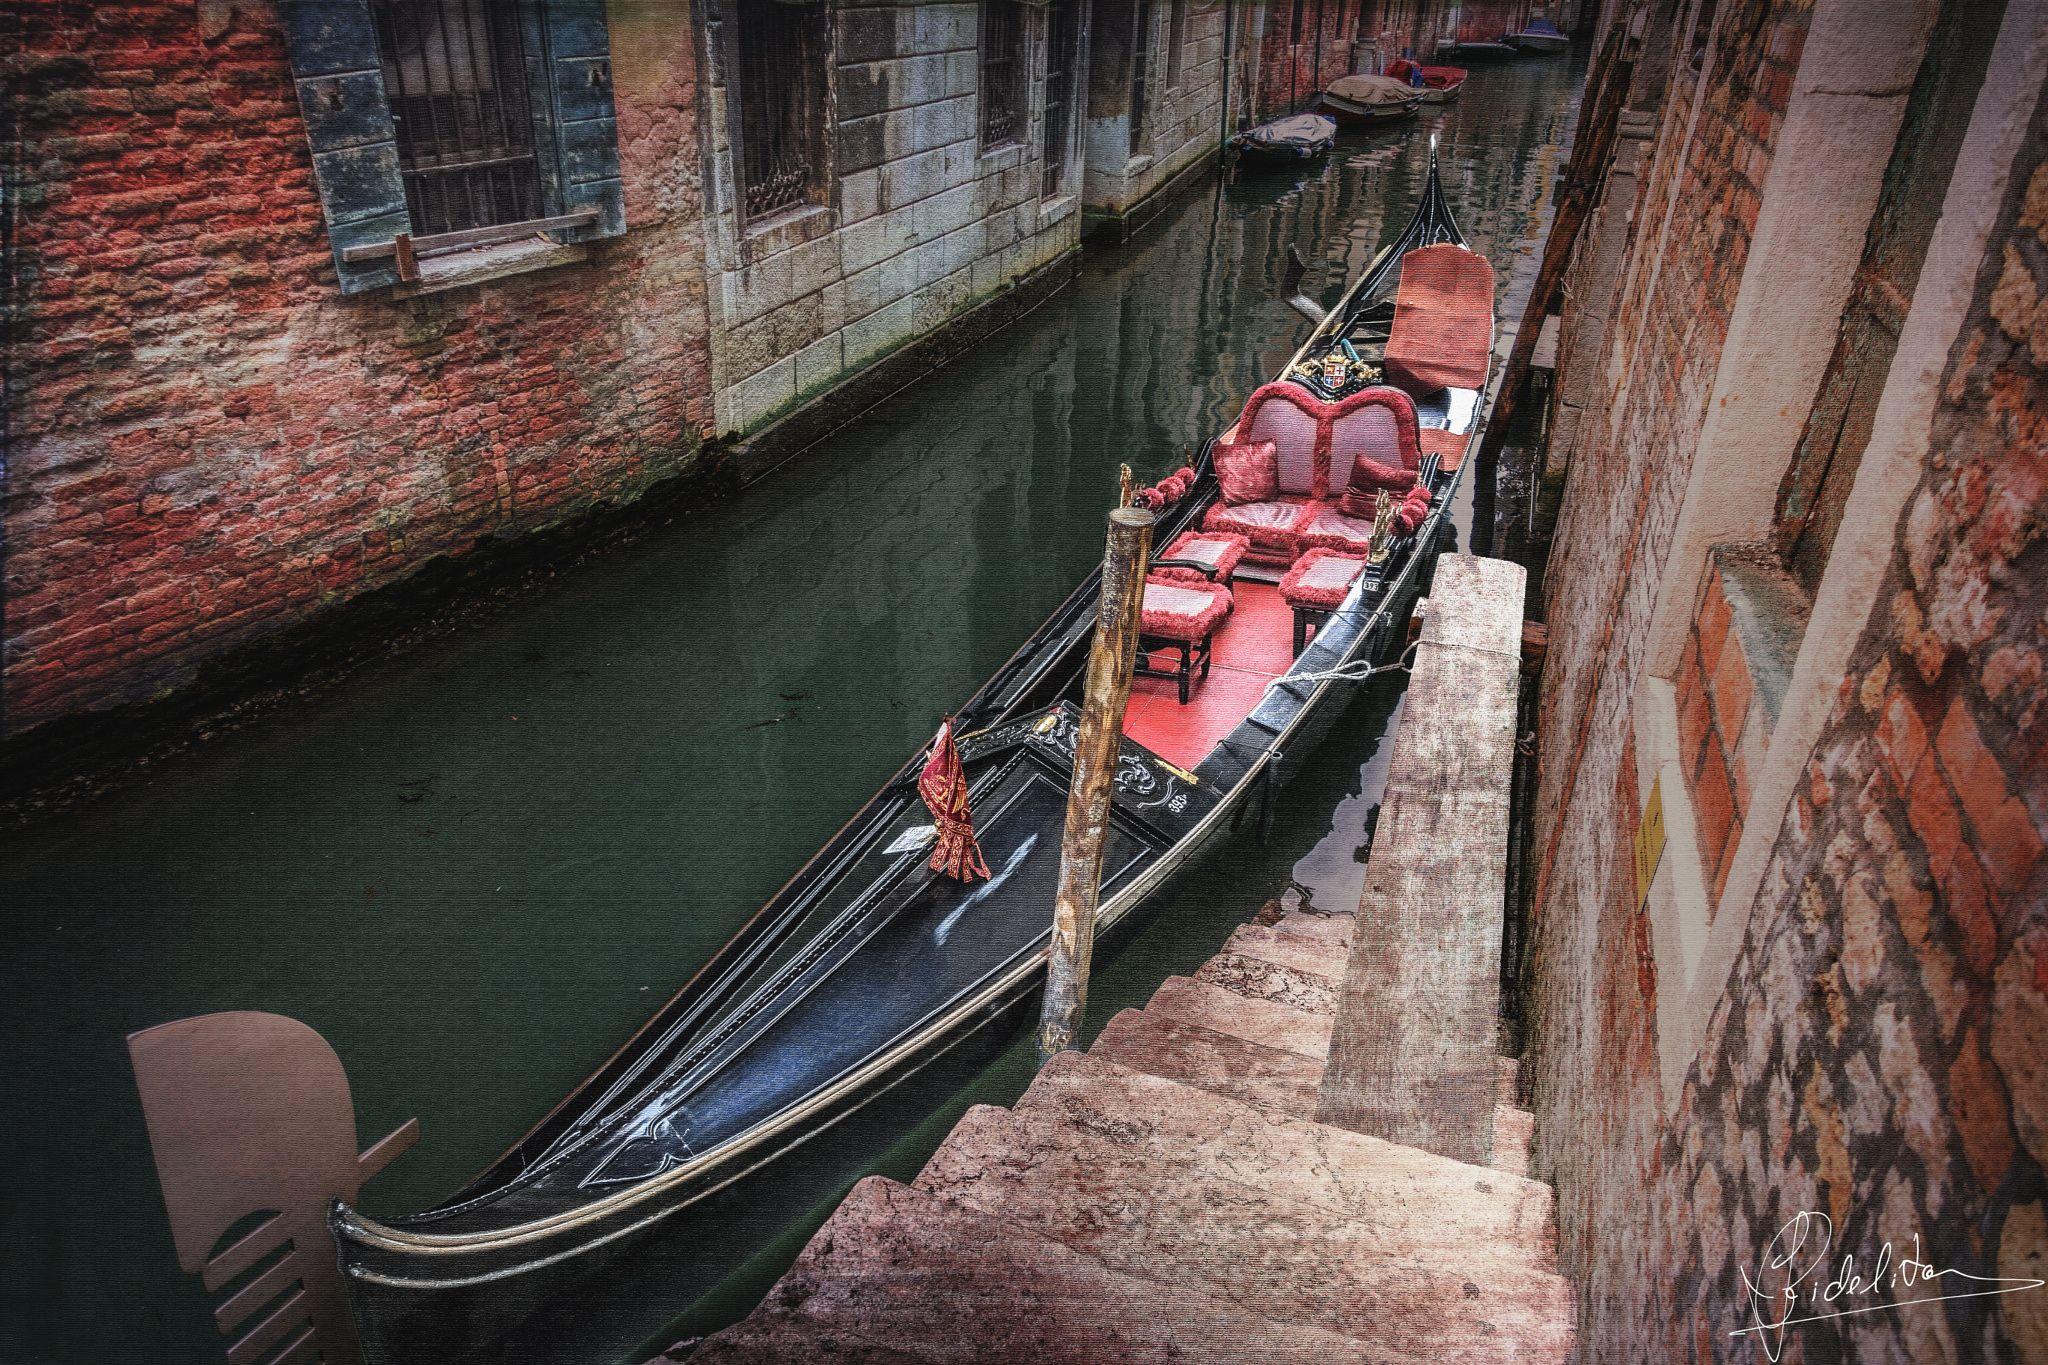 Venezia Awaits (Venice)-final - Venezia Awaits (Venice)-final